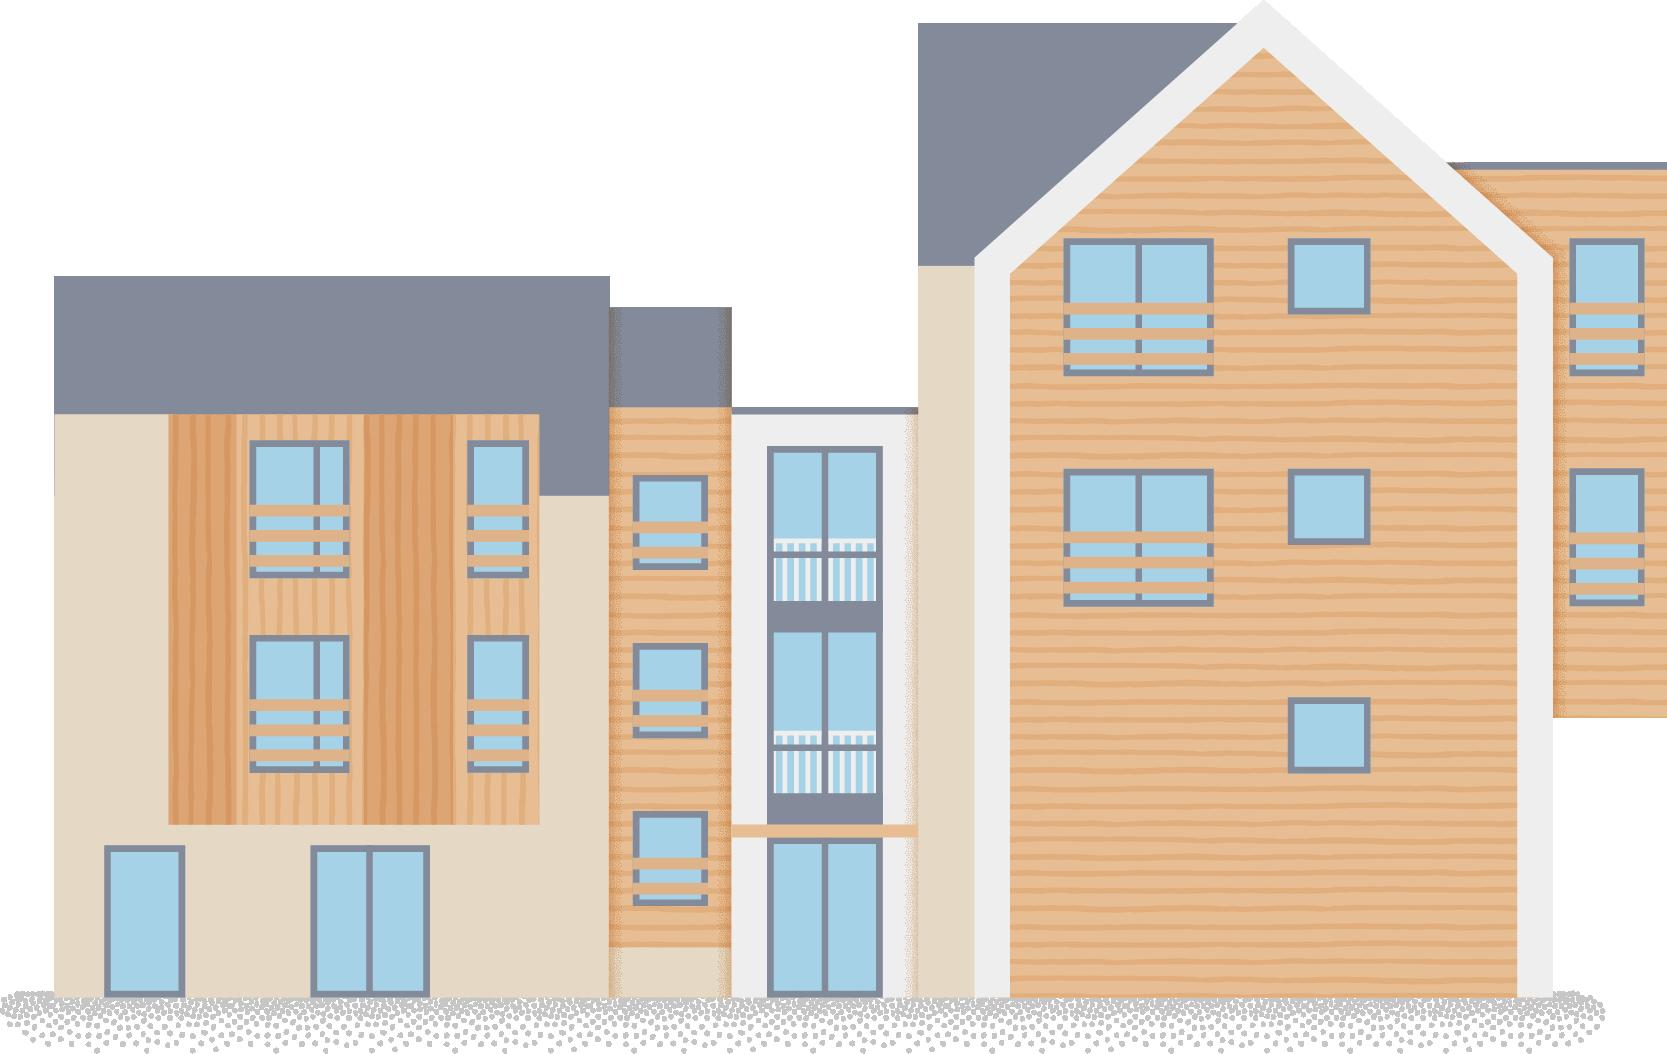 Risbygate Street - Bury St Edmunds - Card